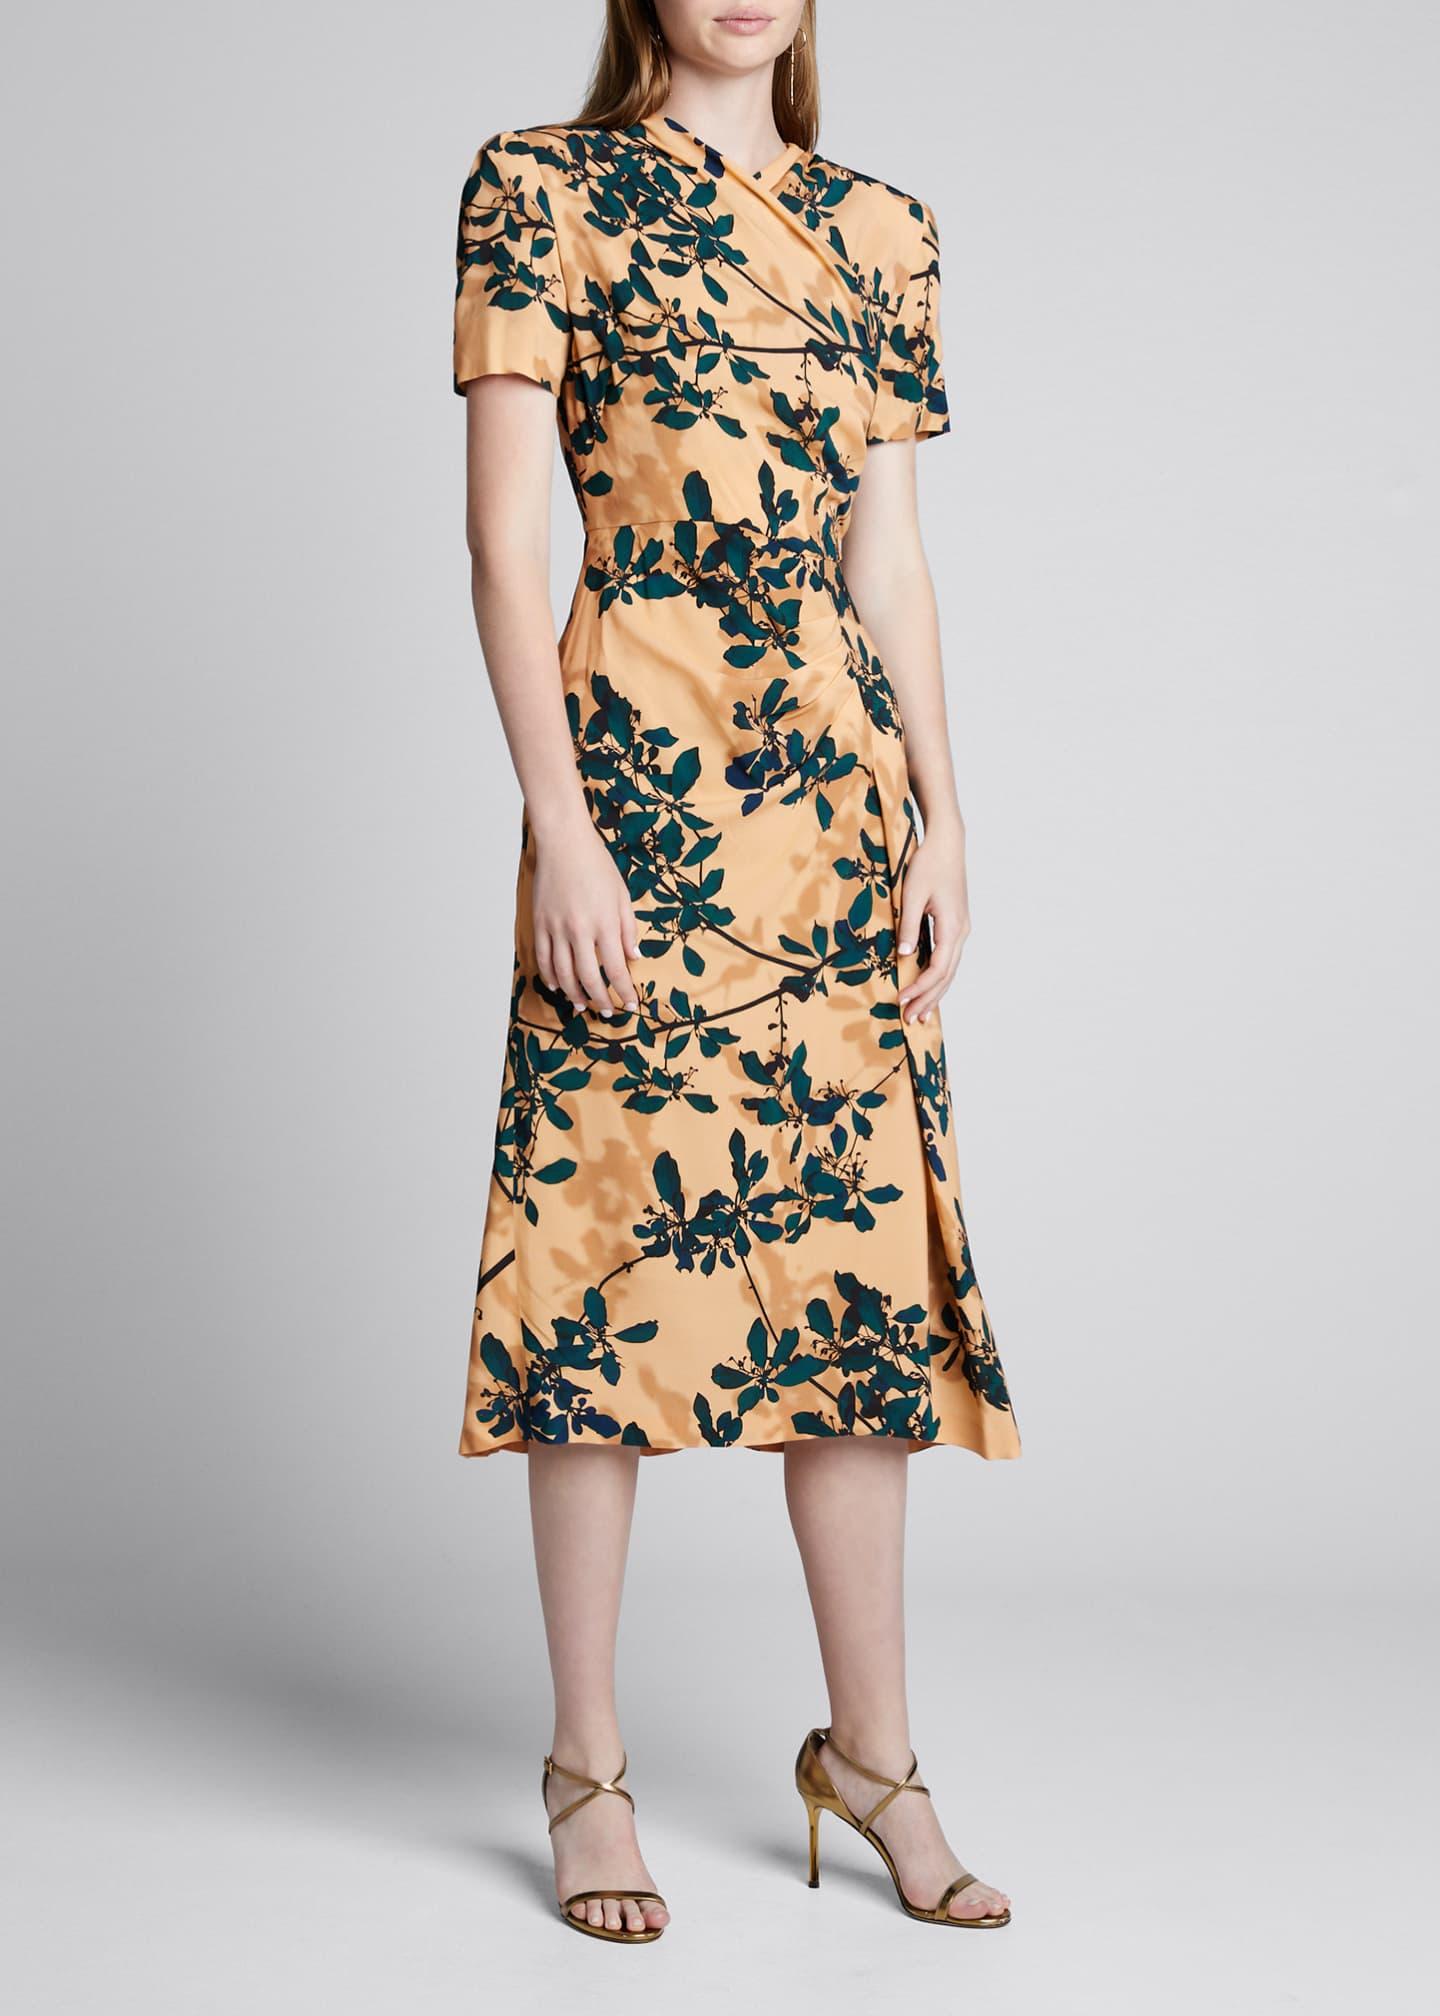 Dries Van Noten Delores Floral Print Draped-Front Dress